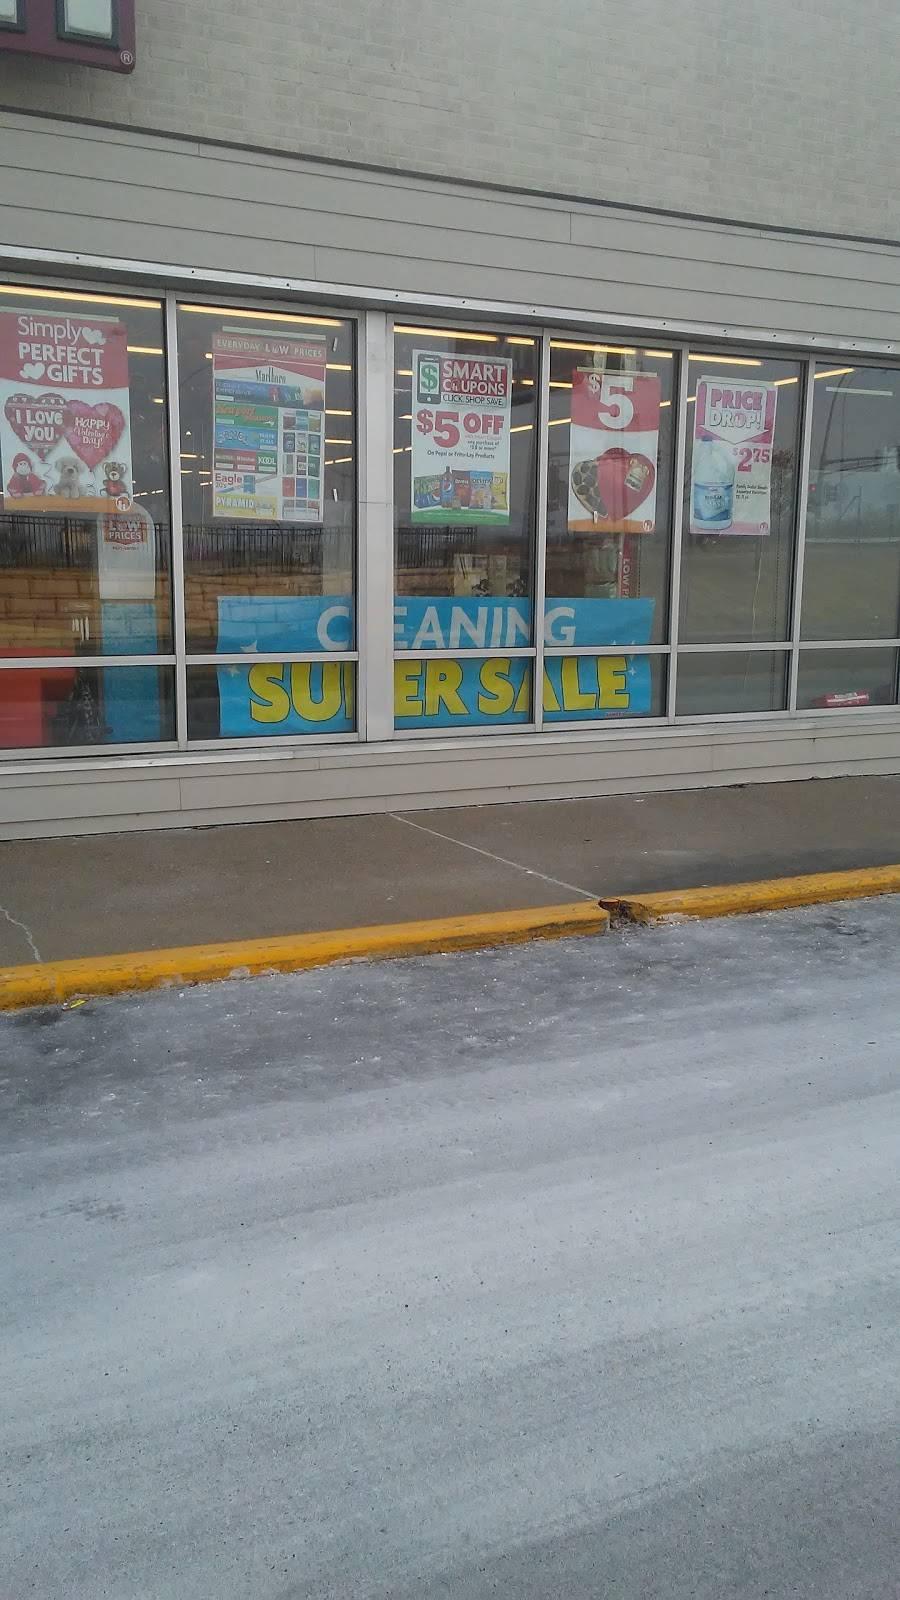 Family Dollar - supermarket  | Photo 6 of 7 | Address: 2105 57th Ave N, Brooklyn Center, MN 55430, USA | Phone: (763) 560-9697